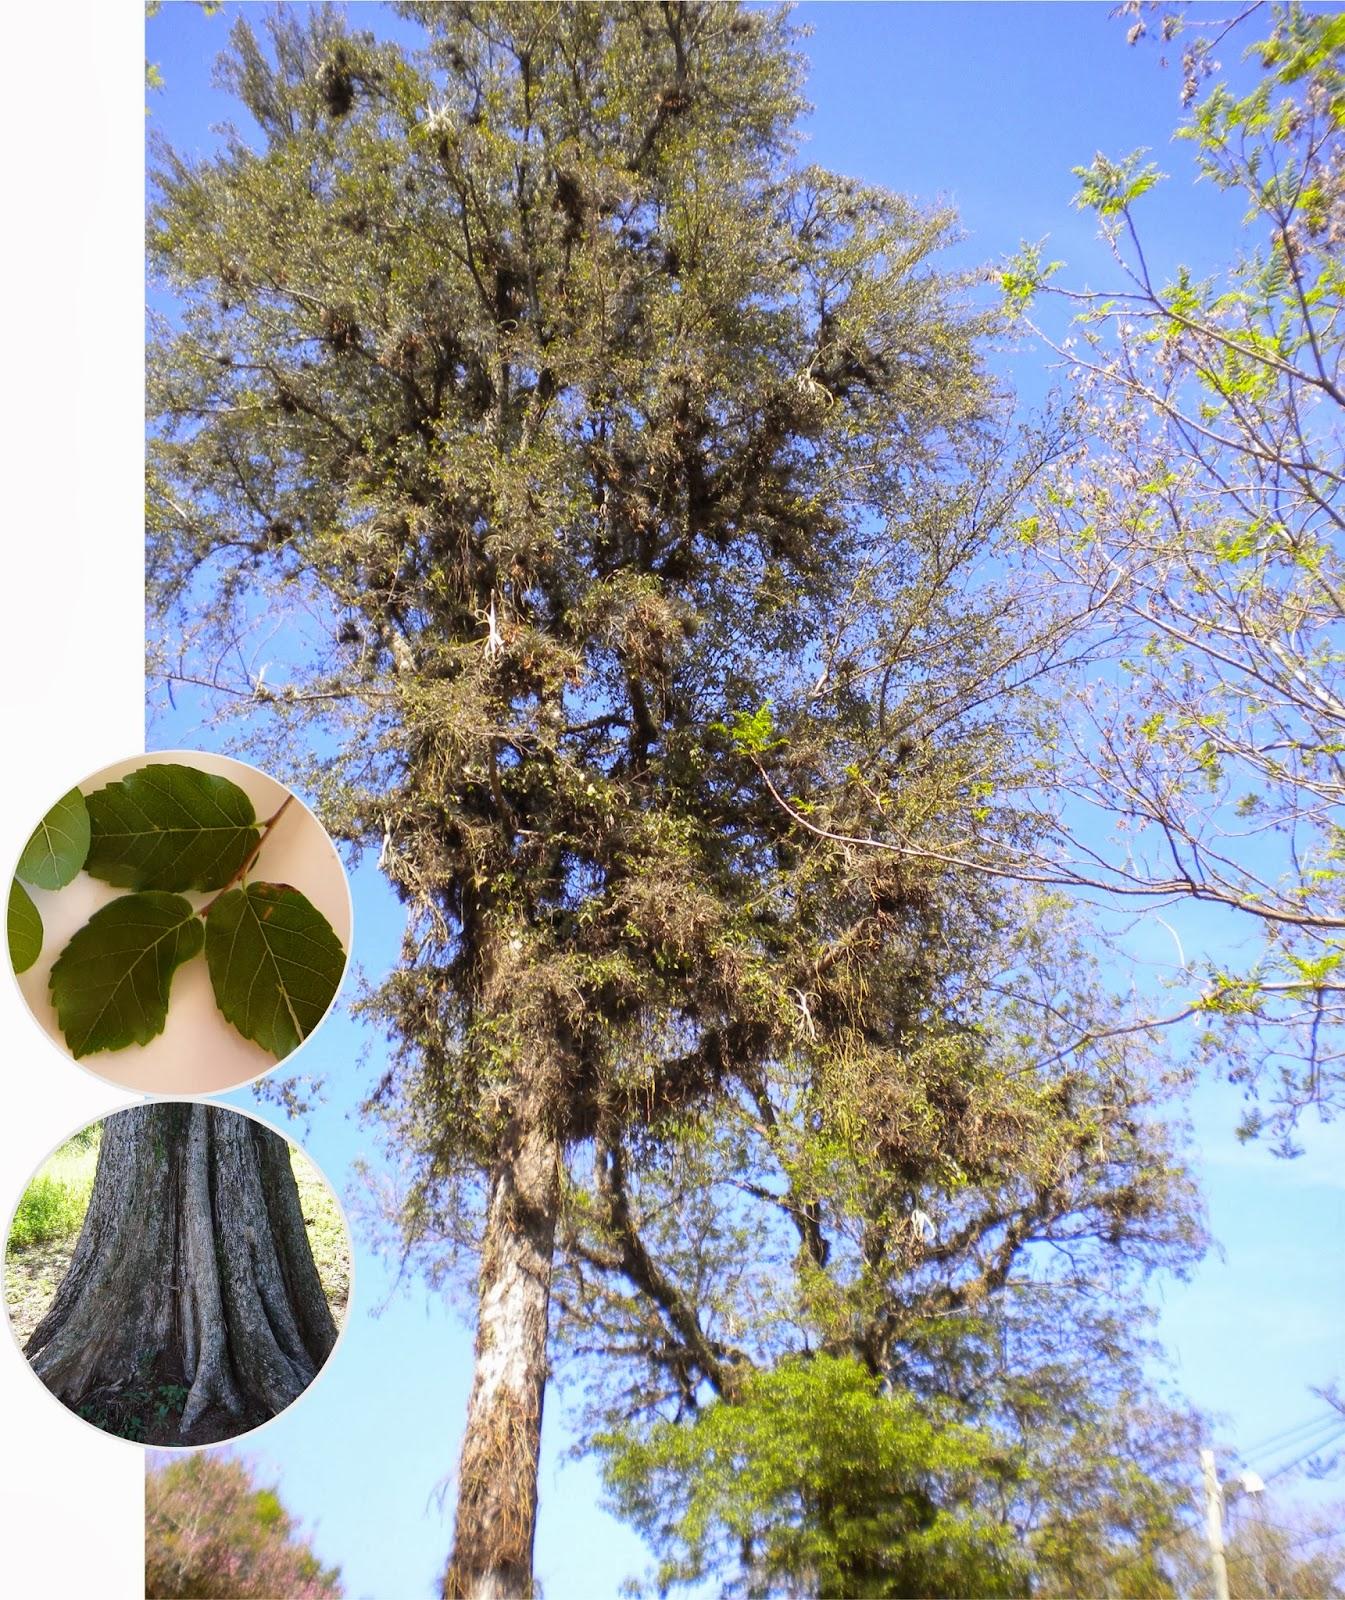 V e r d e c h a c o palo lanza juasy y guasu cuta for Arboles perennes en argentina